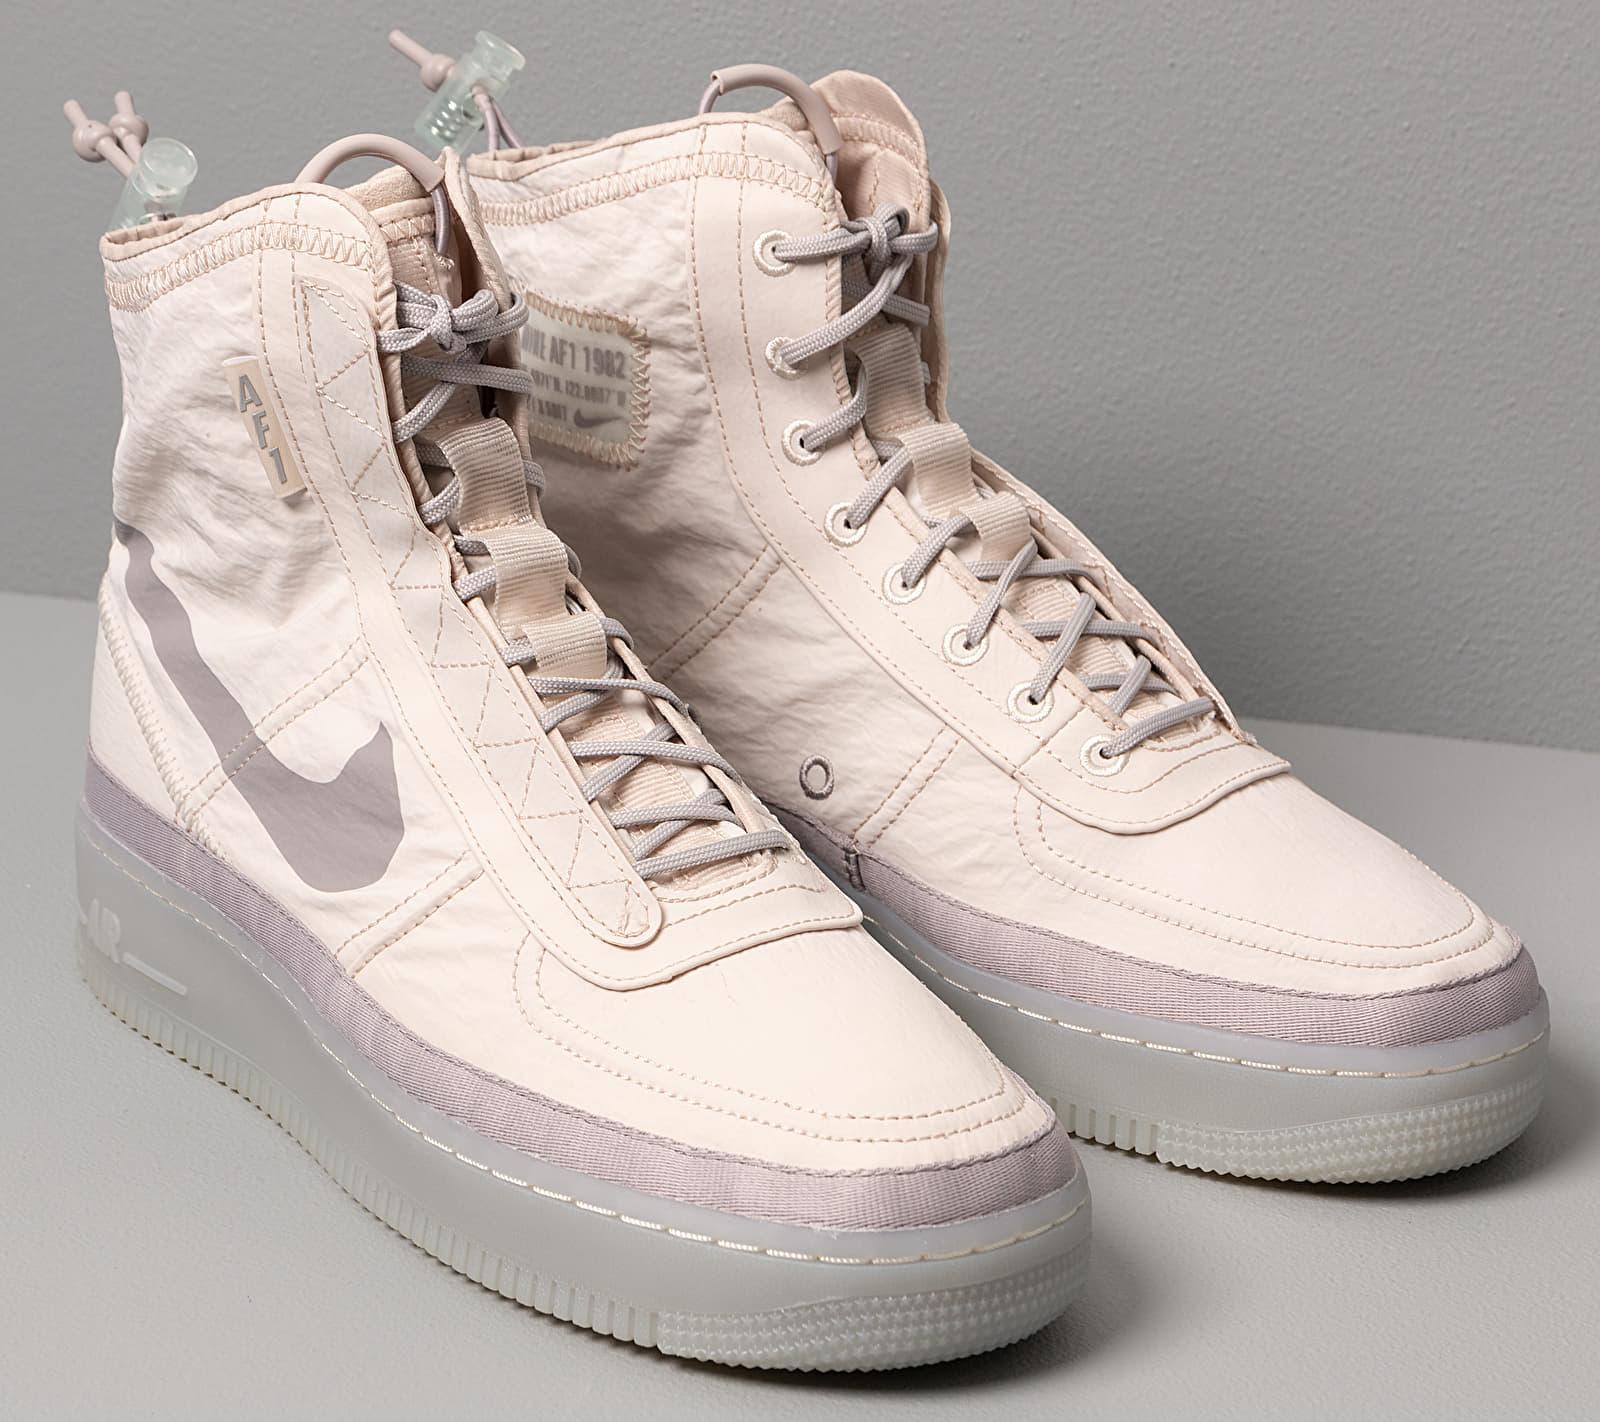 nike sportswear w's air force 1 shell